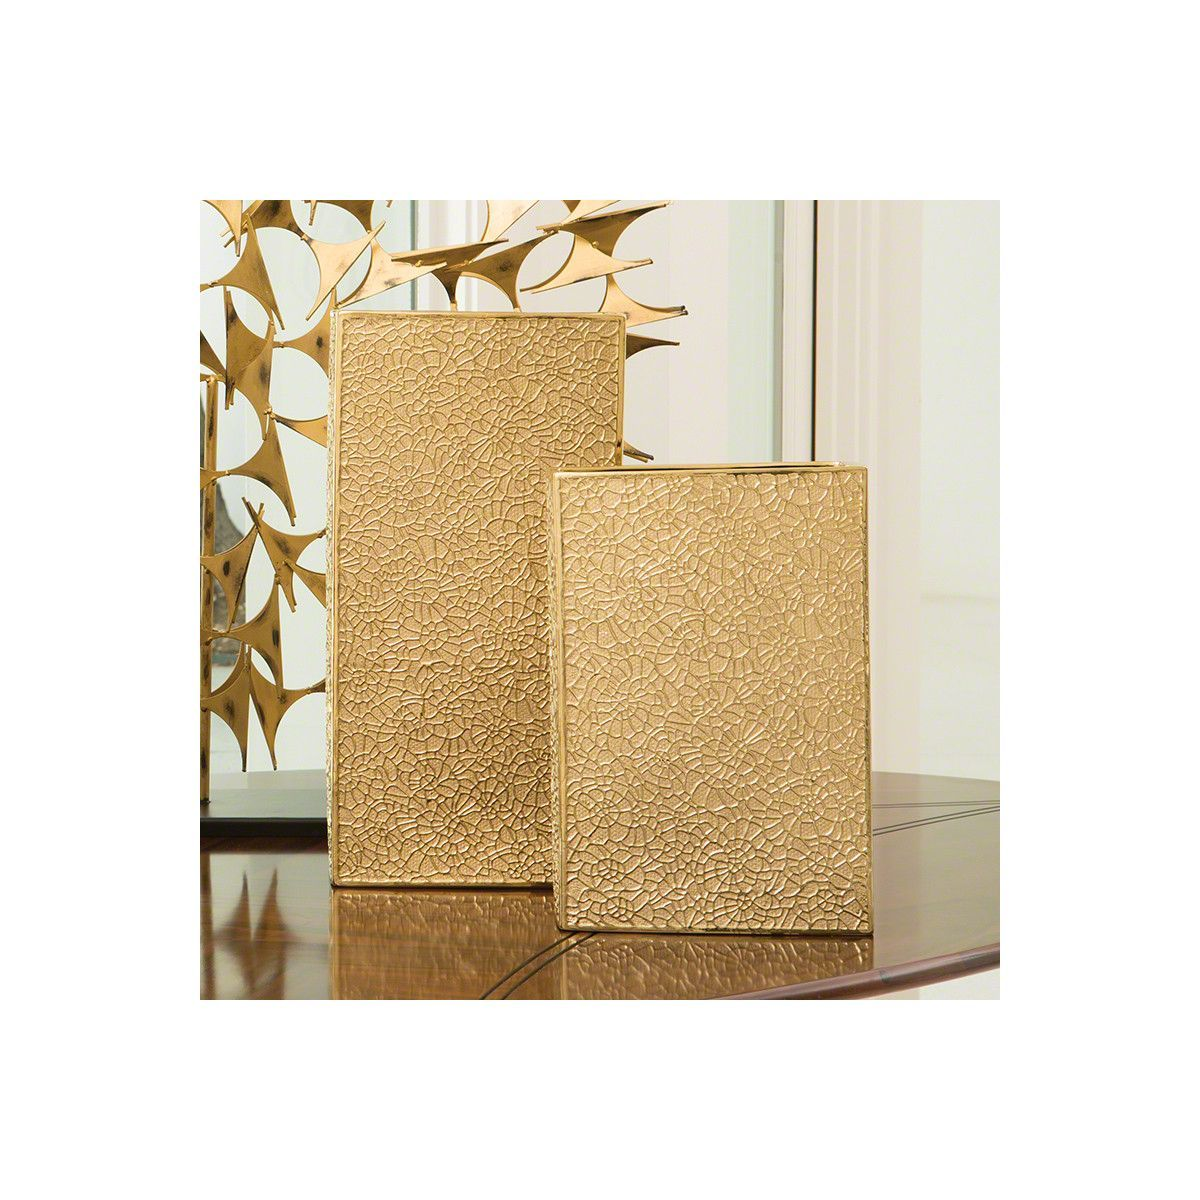 Global Views Organic Lace Vase - Gold